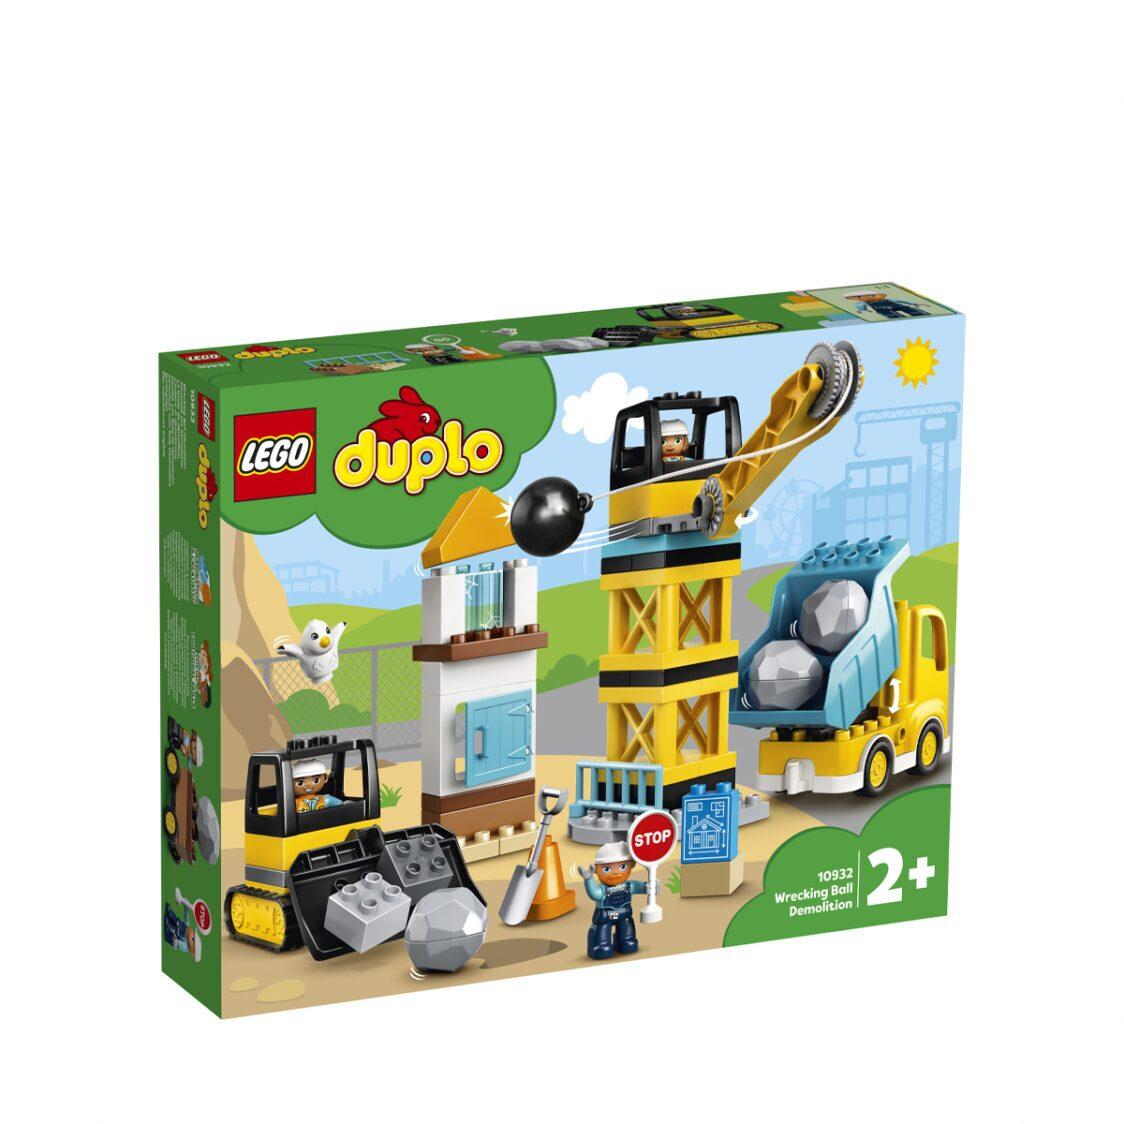 LEGO Wrecking Ball Demolition 10932 V29